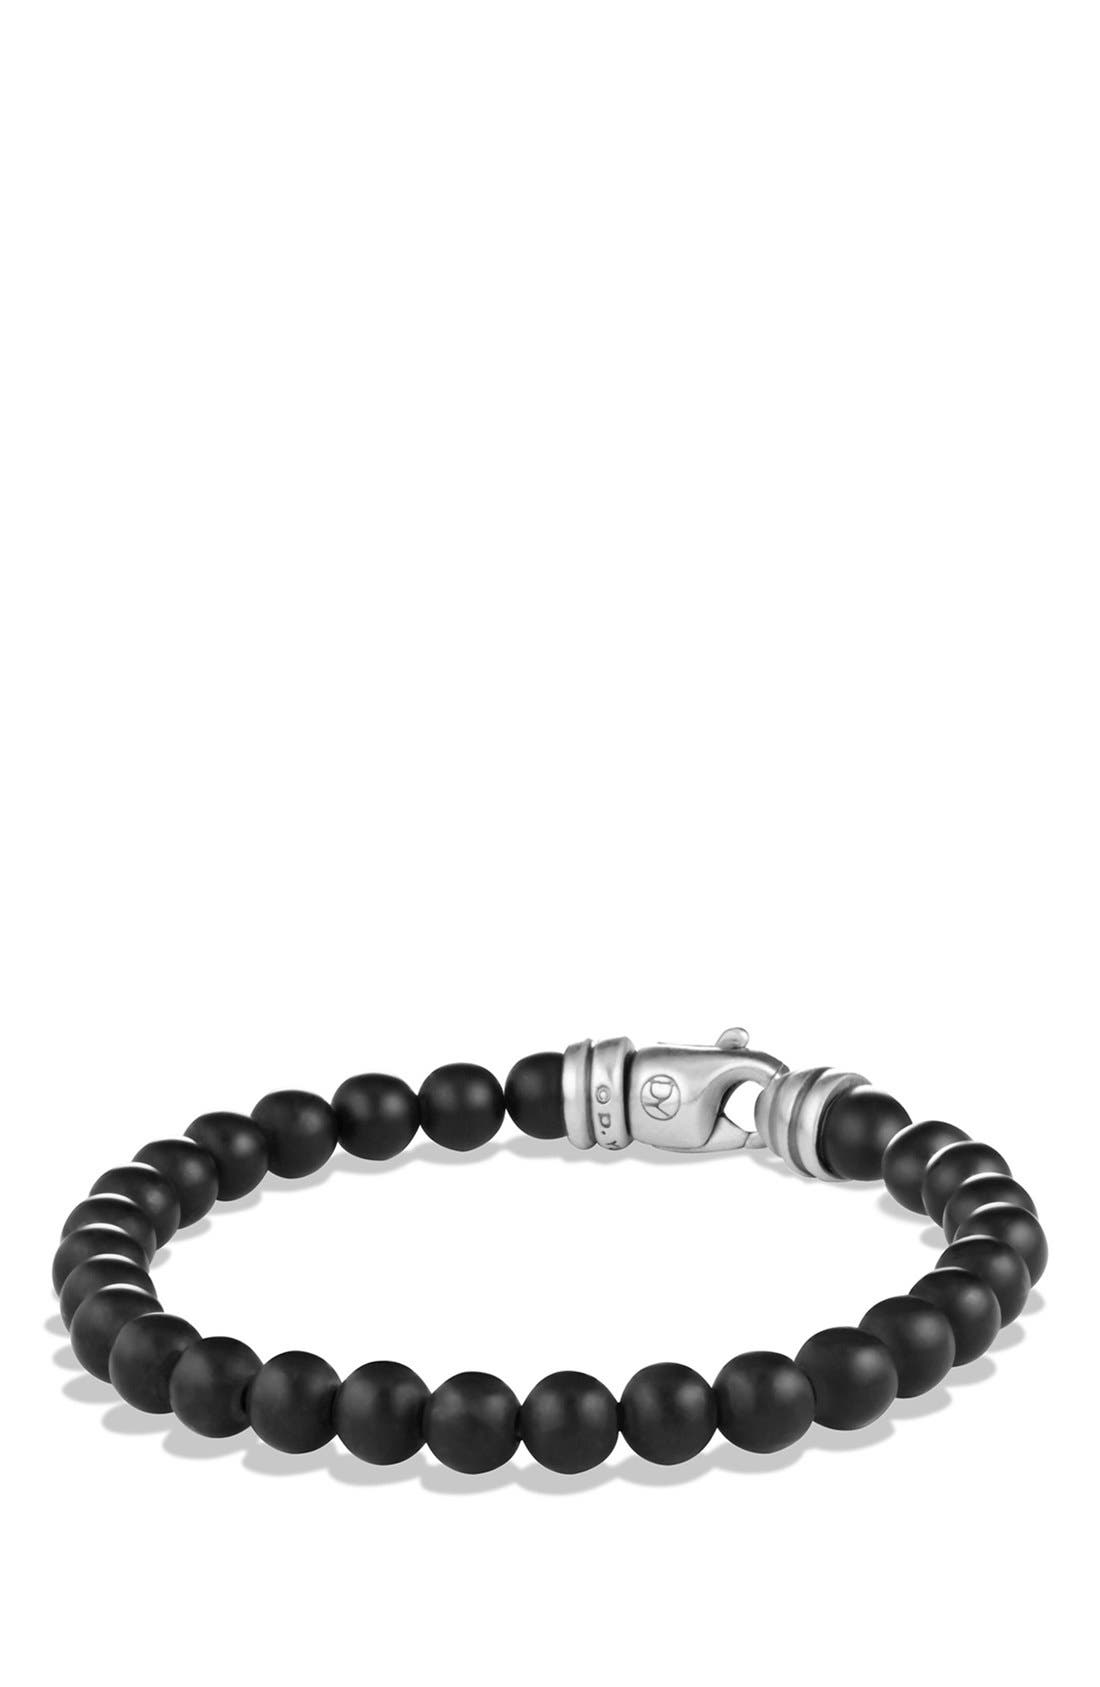 'Spiritual Beads' Bracelet,                             Main thumbnail 1, color,                             Black Onyx